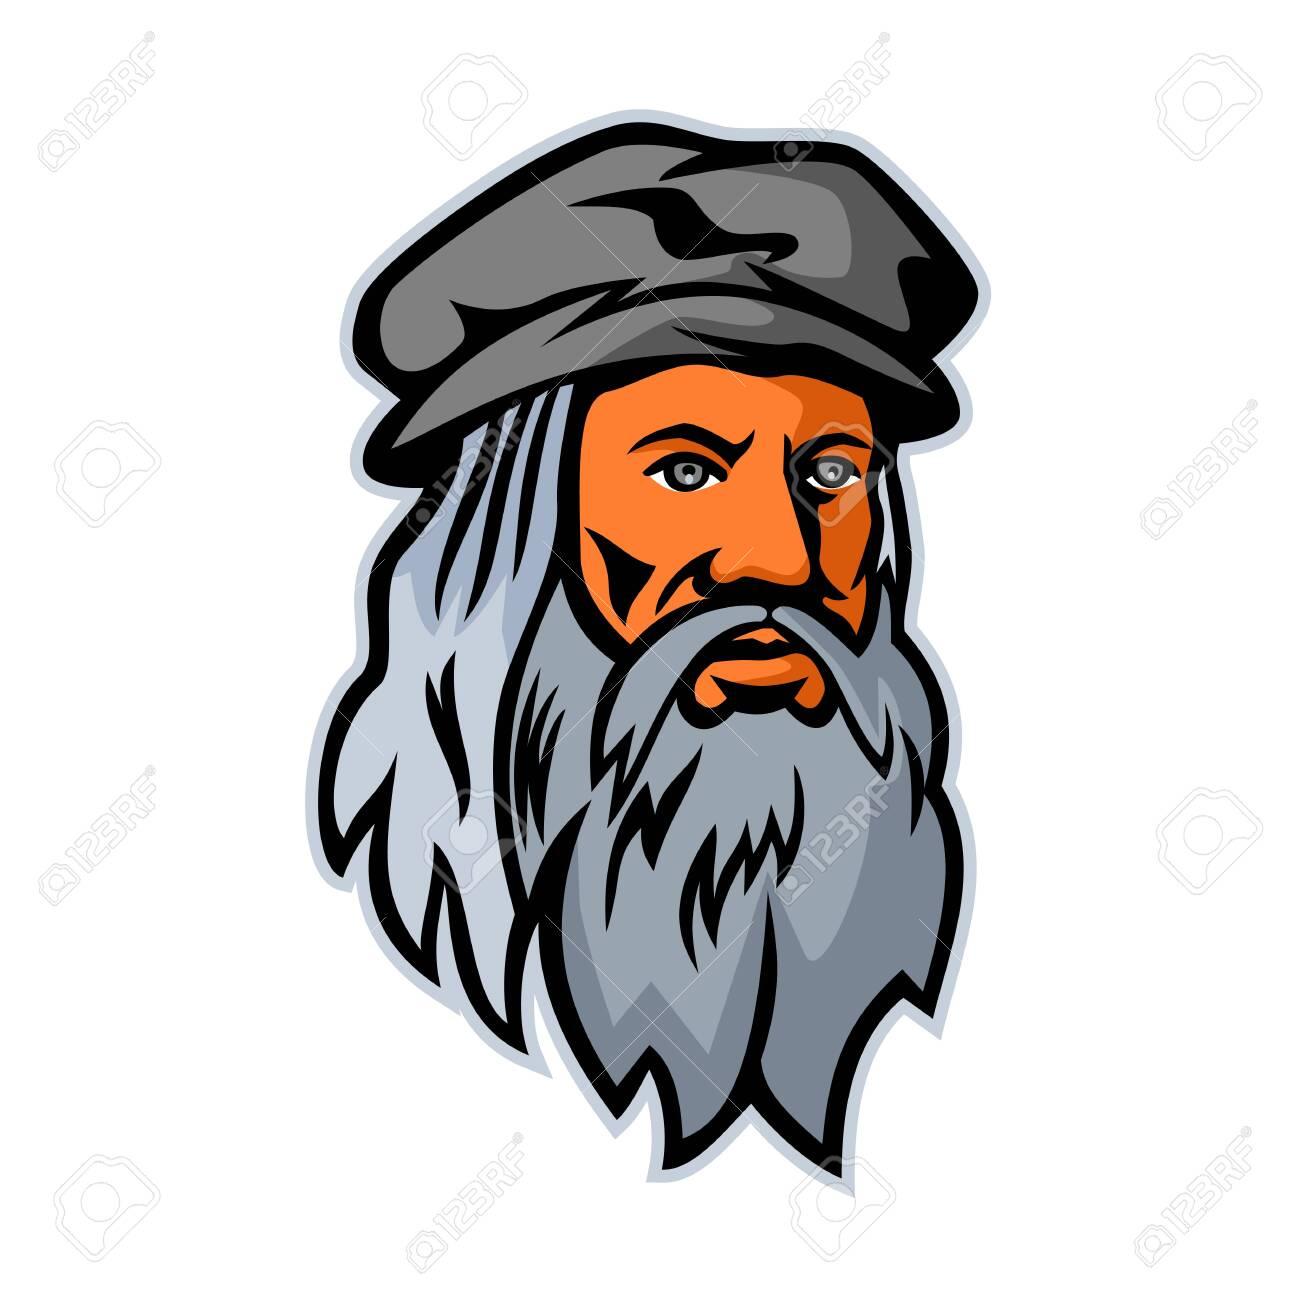 Mascot icon illustration of head of Leonardo di ser Piero da Vinci, more commonly Leonardo da Vinci, an Italian polymath of the Renaissance viewed from front on isolated background in retro style. - 127925252